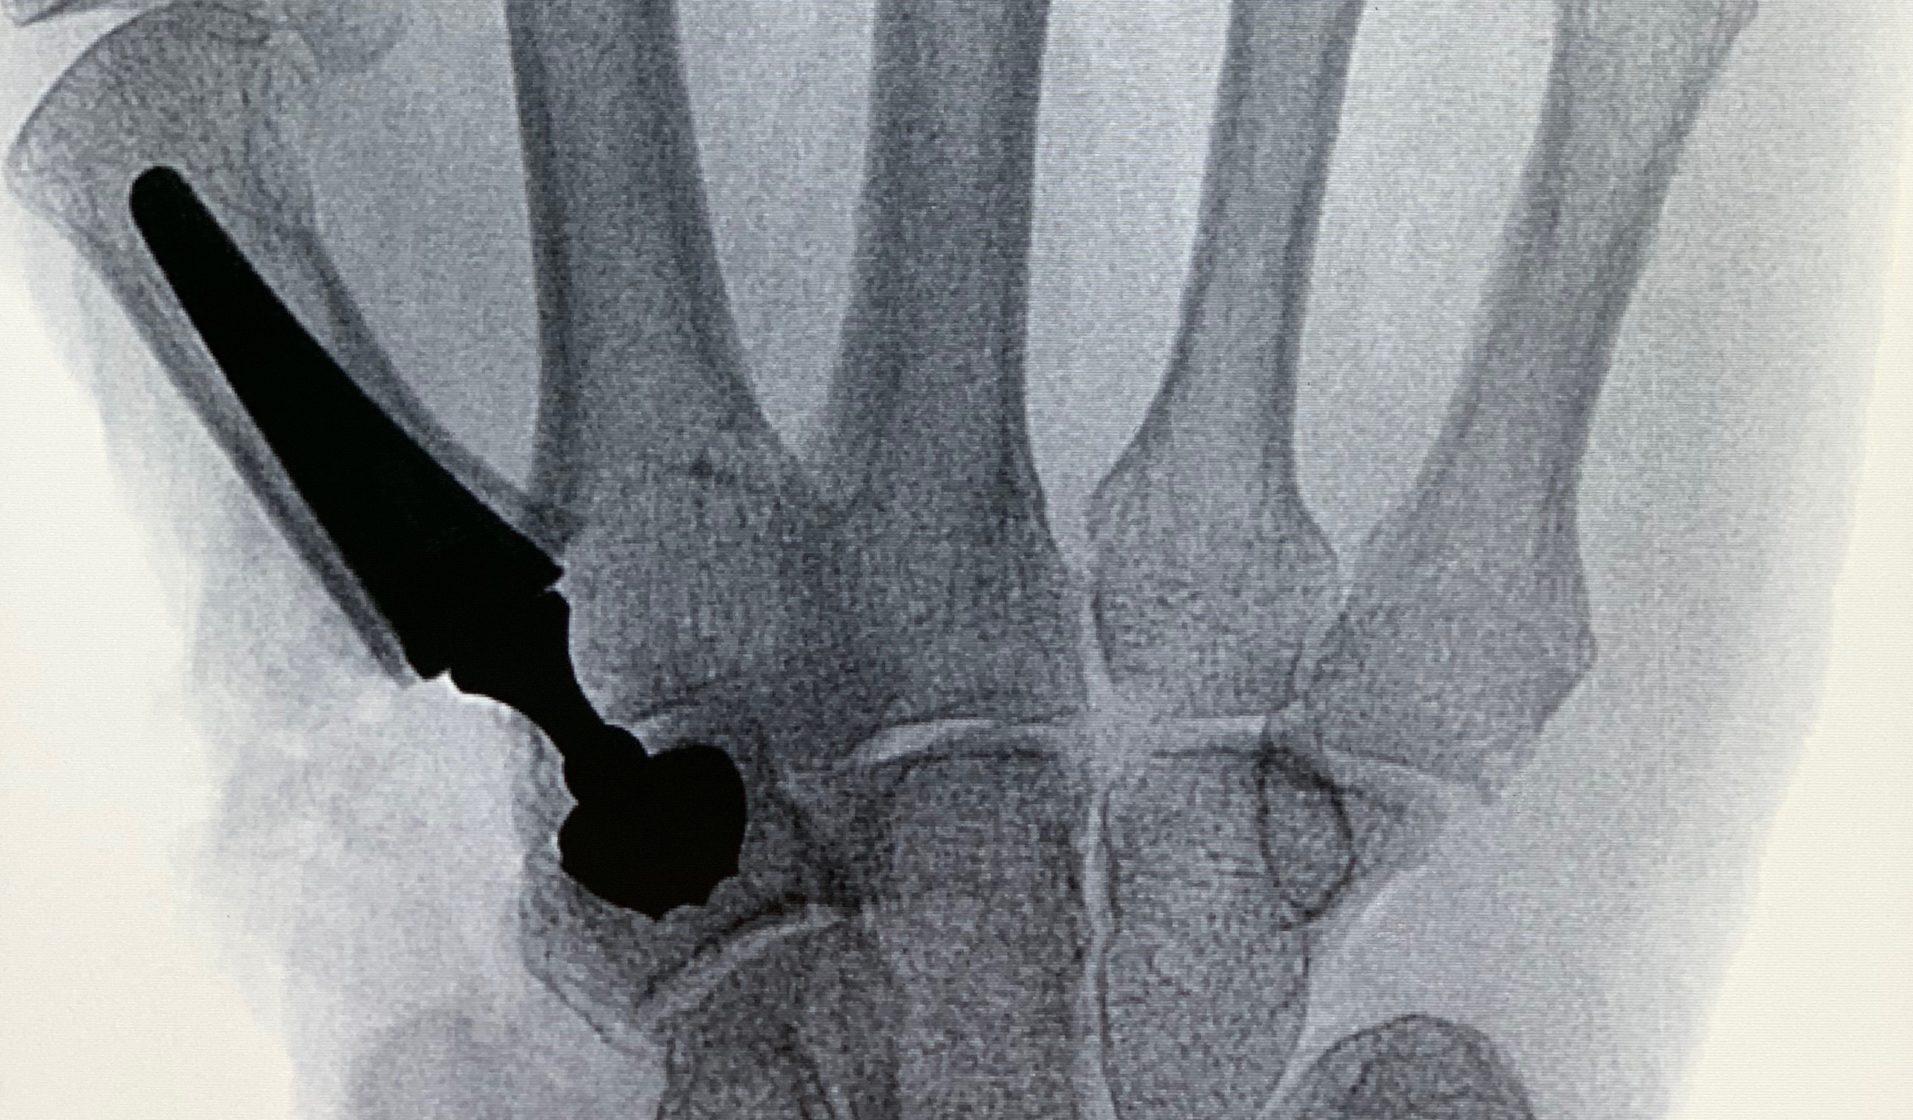 Kerimedical Touch, Prothese, Daumensattelgelenk, Daumensattelgelenkarthrose Rhizarthrose, Sebastian Kluge, Handchirurgie Seefeld, Archamps